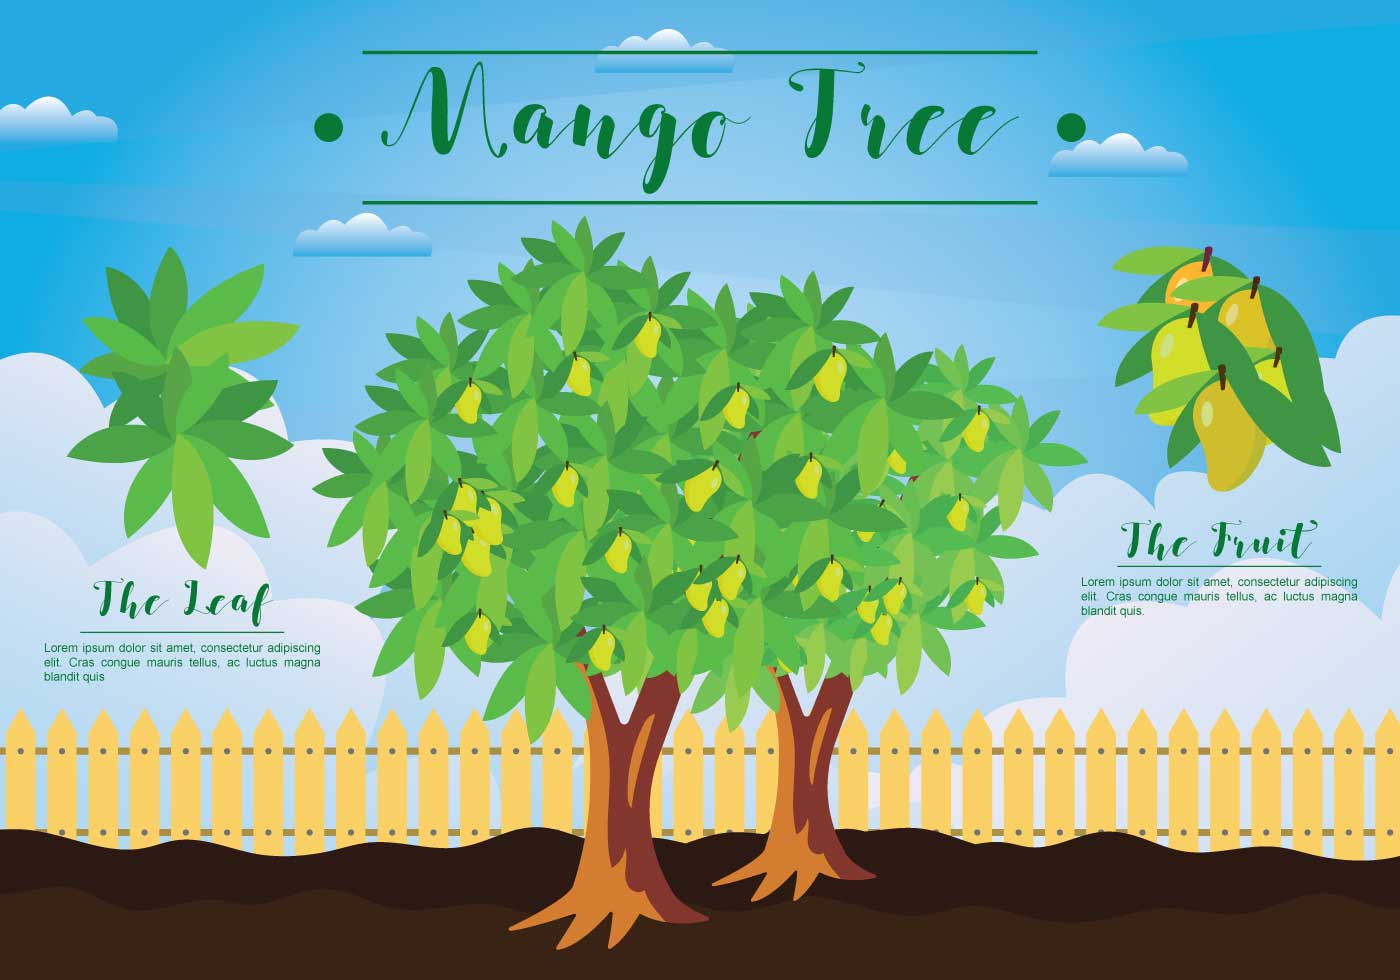 Free Mango Tree Illustration Download Free Vector Art